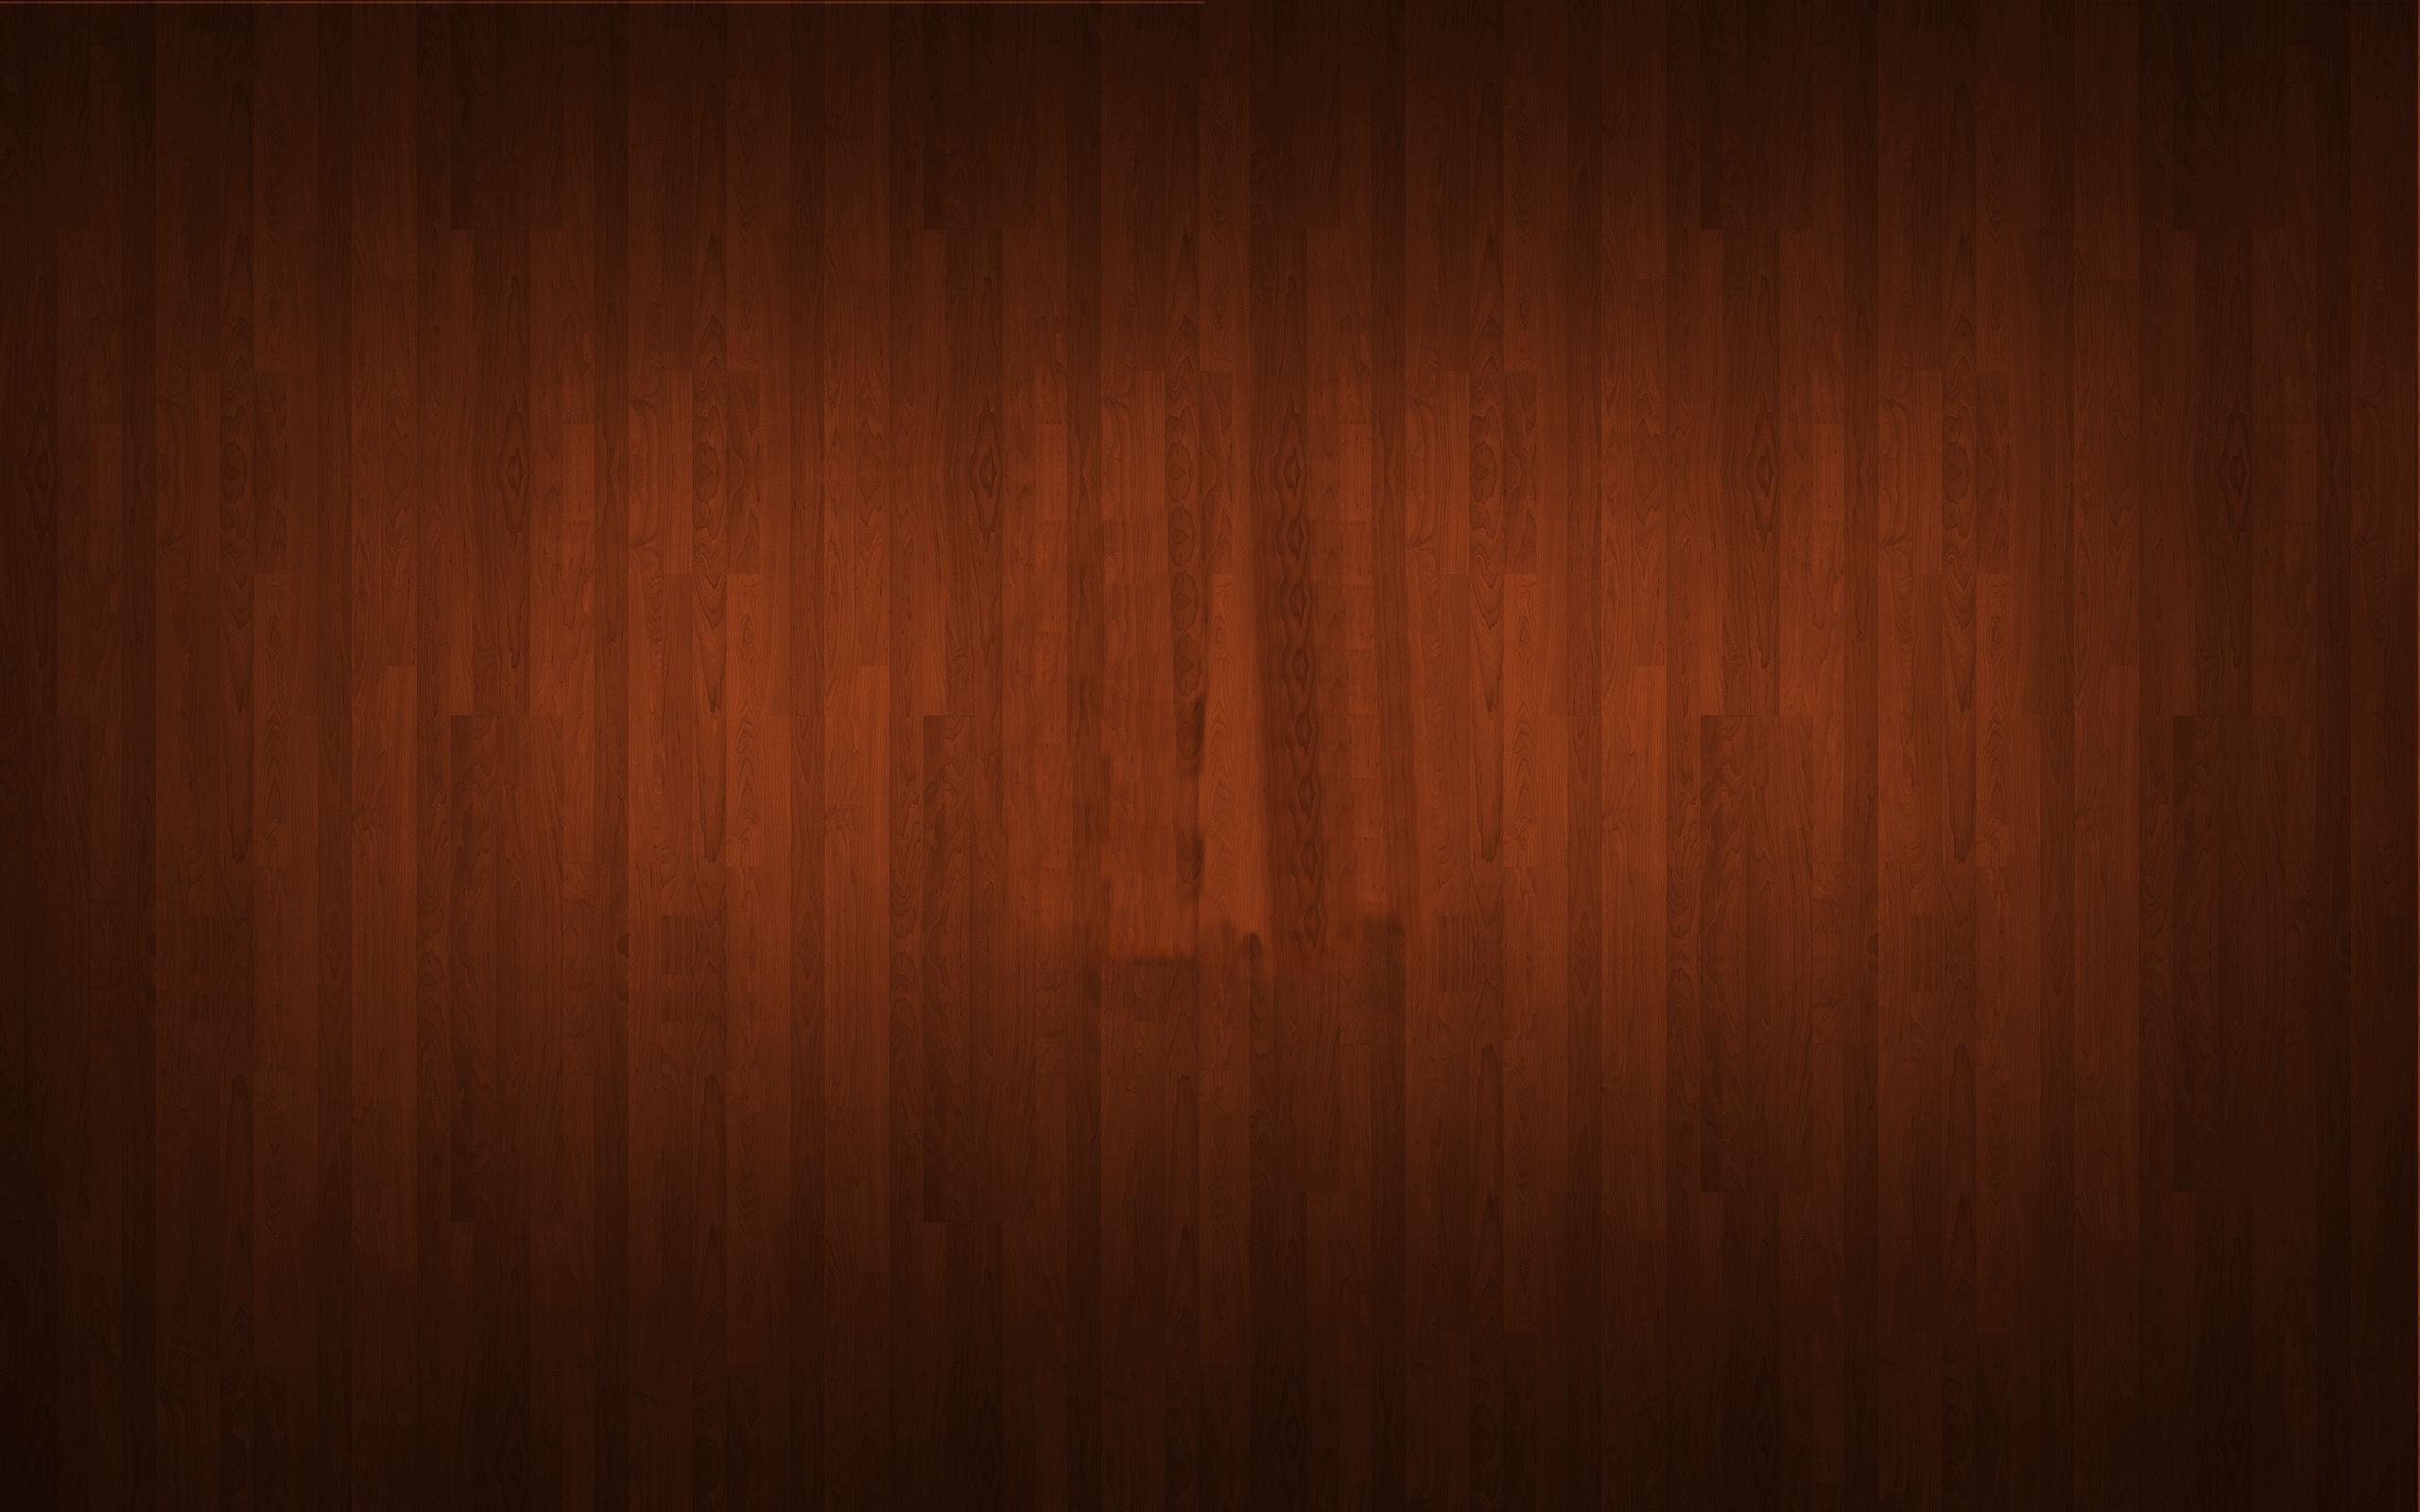 dark brown hardwood floor texture. Dark Wood Brown Texture Wooden Floor Hardwood Plywood Computer Wallpaper Flooring Stain Varnish